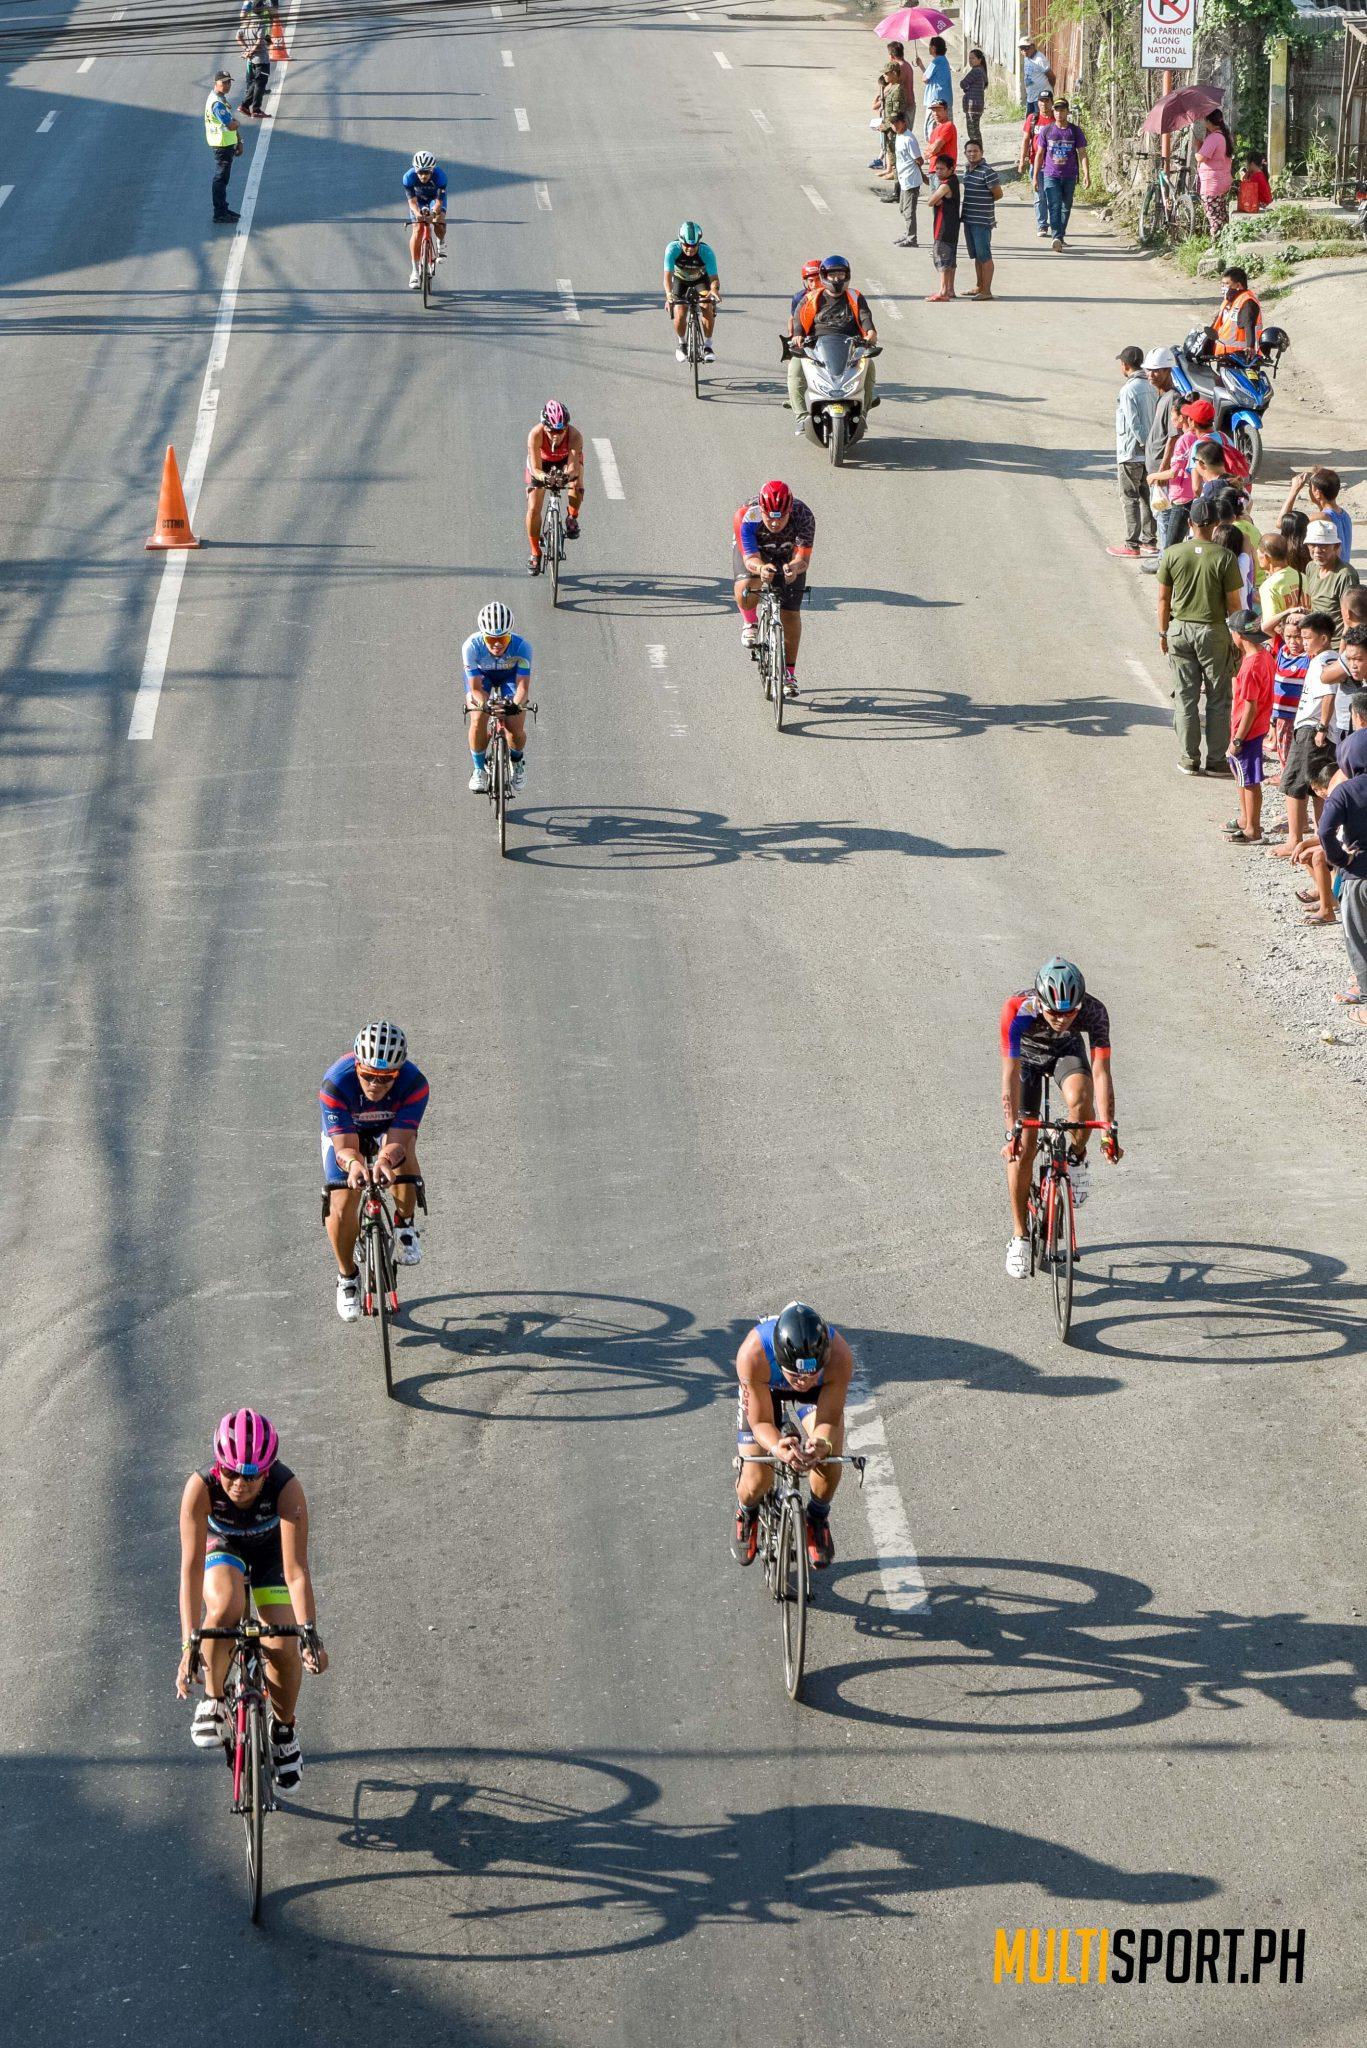 Gallery: 2019 Alveo Ironman 70.3 Davao race day